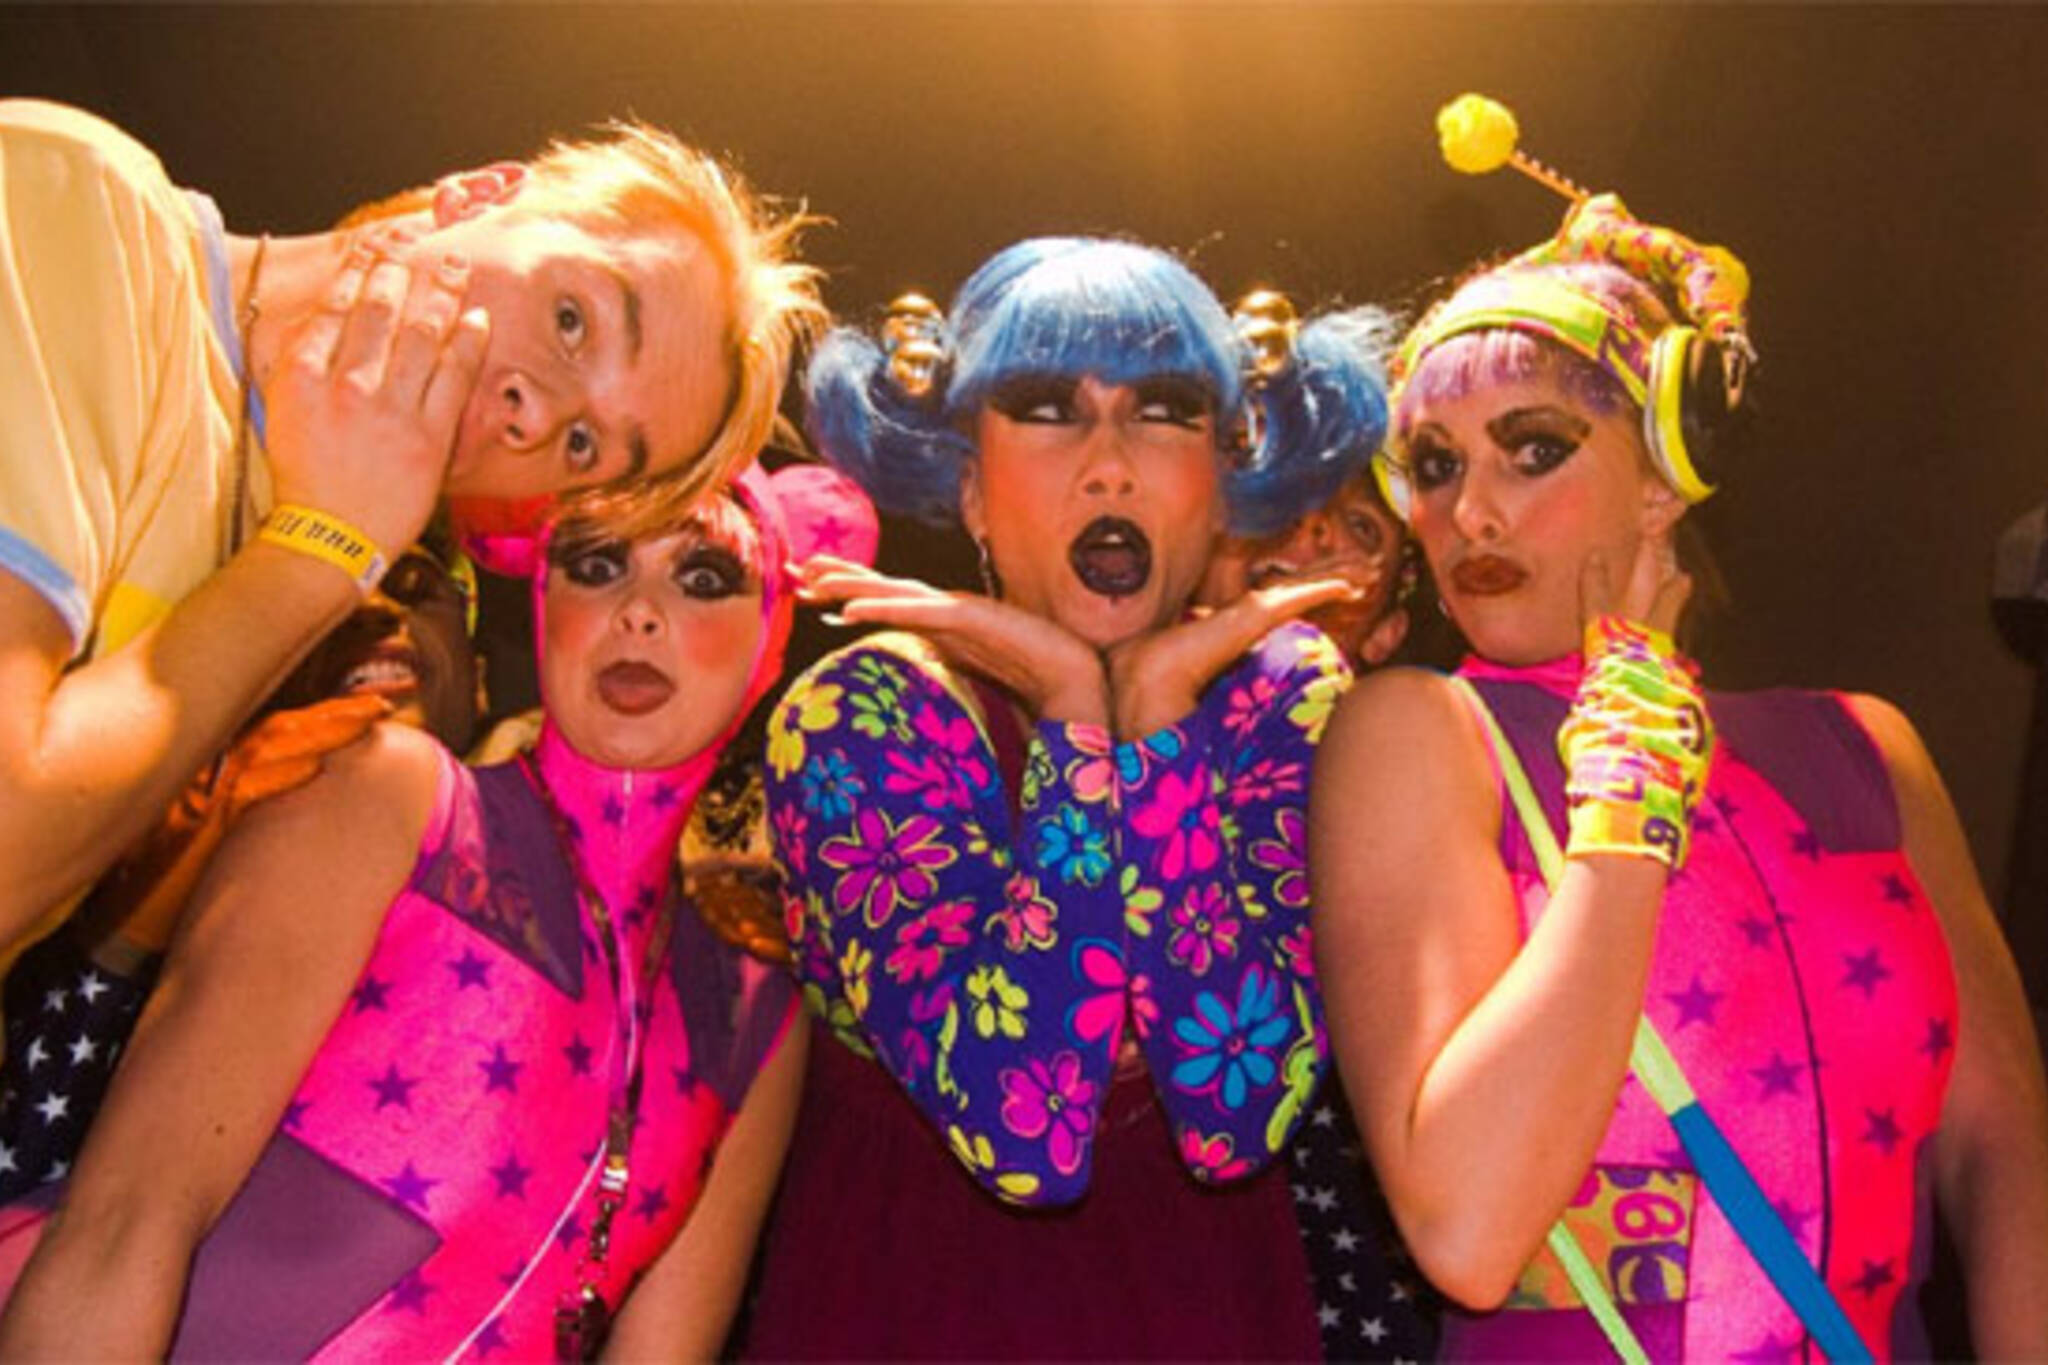 Lena Love's Circus Troupe